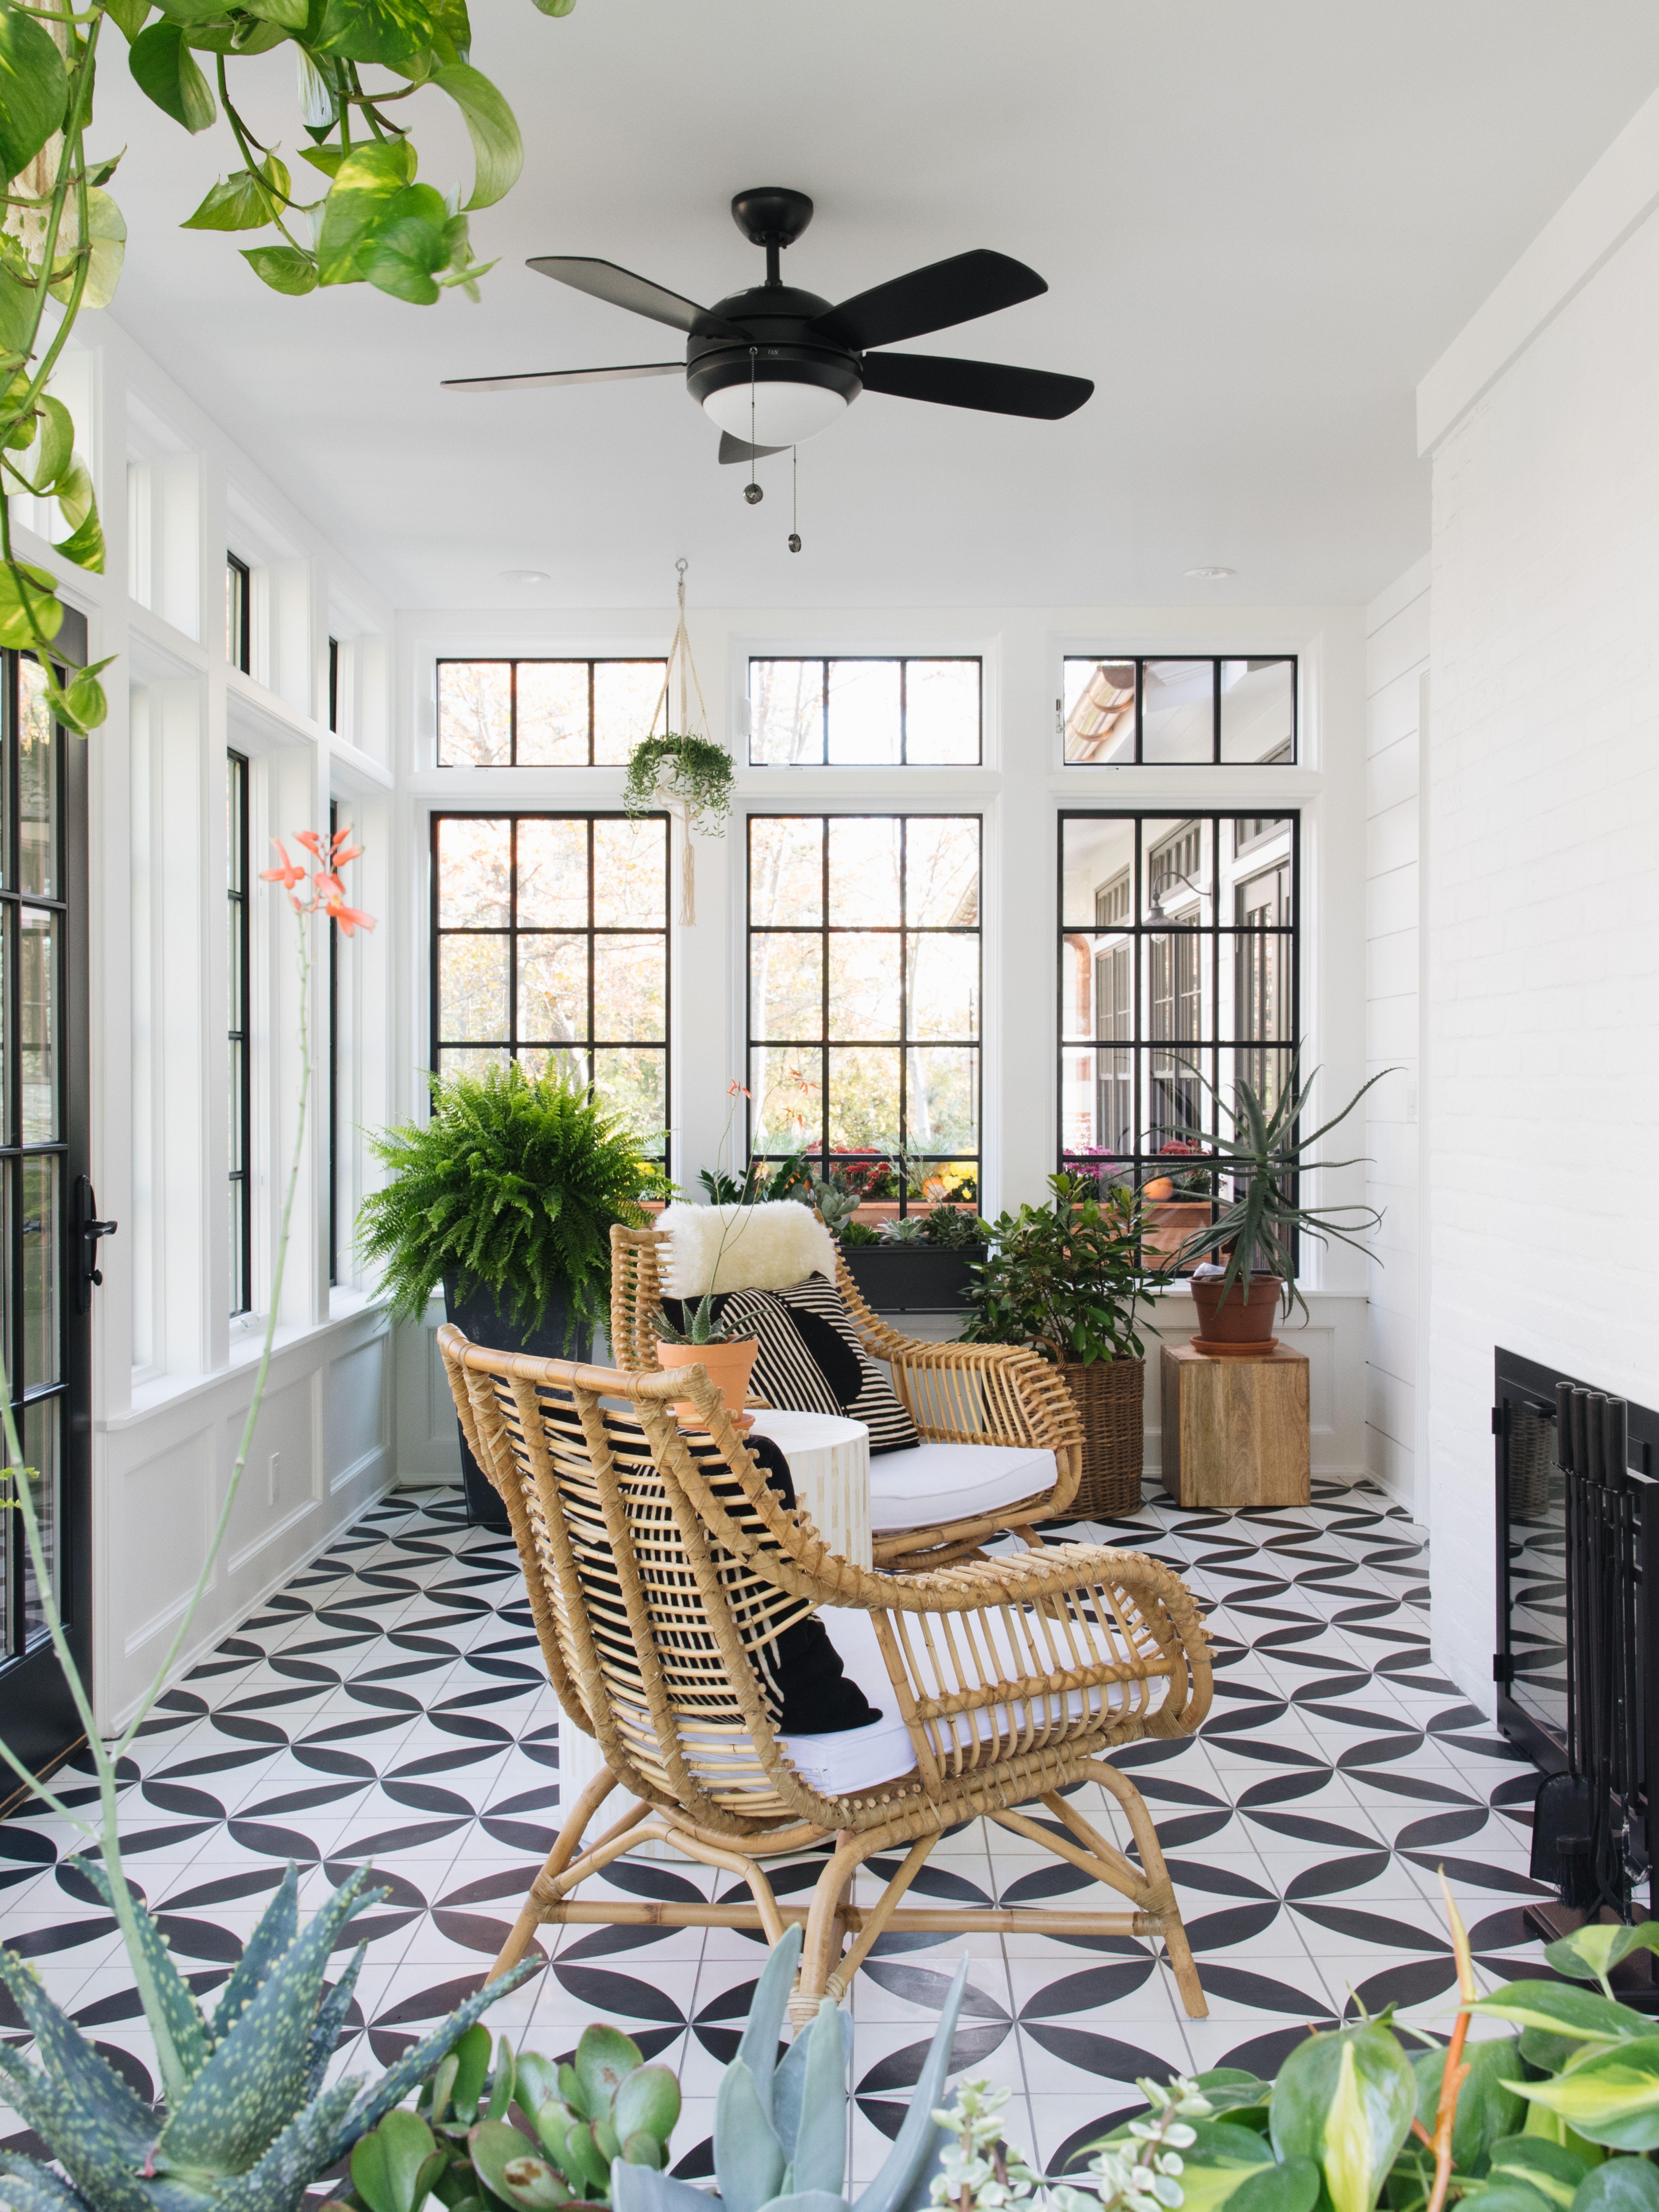 Cement Big Dane White Black Square 8 X8 X5 8 Sunroom Decorating Sunroom Designs Patio Flooring